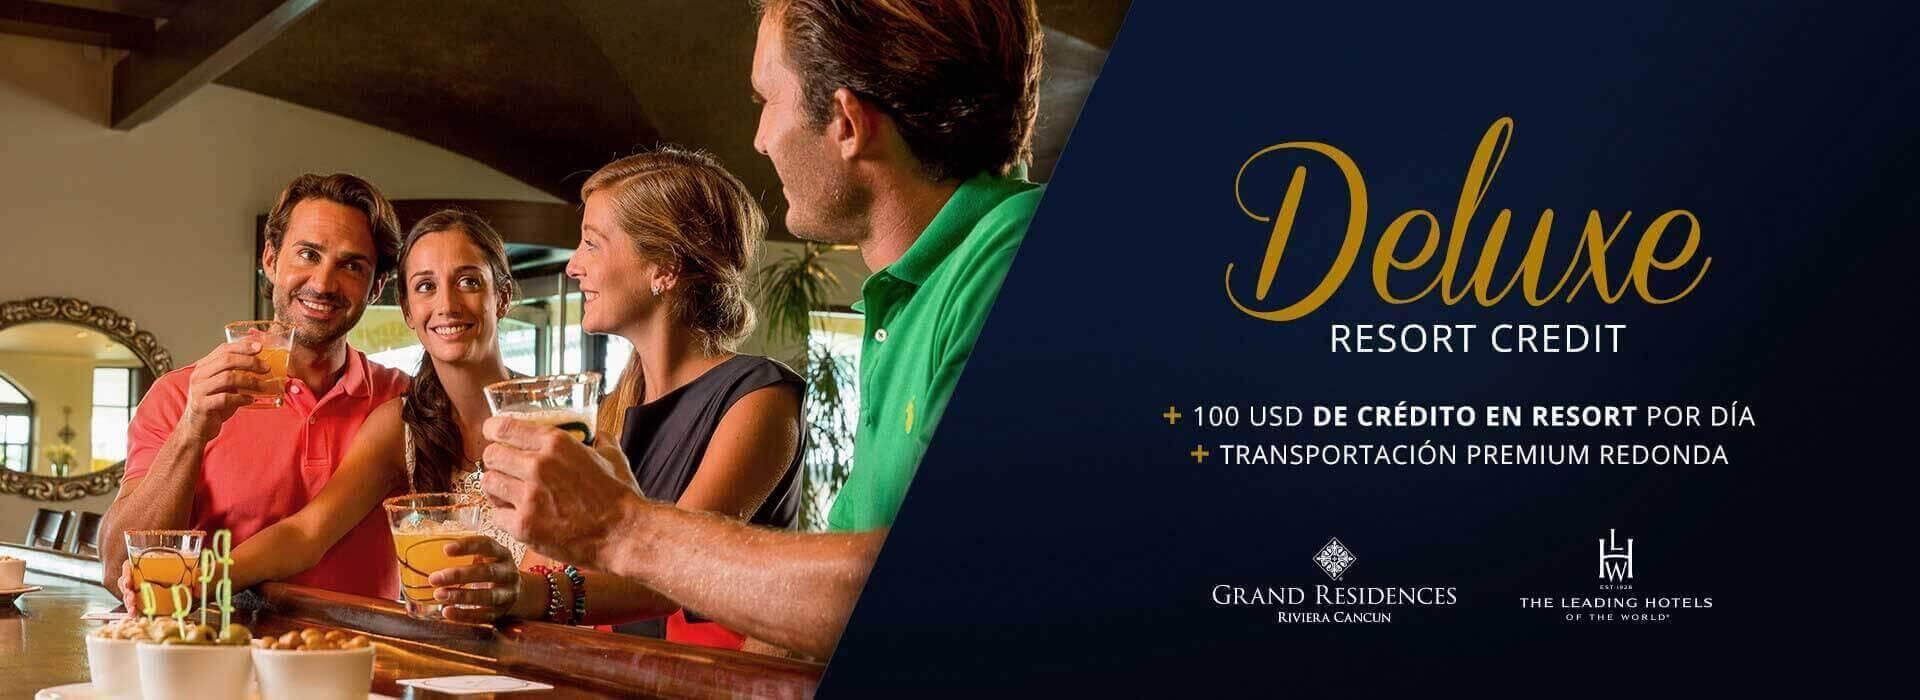 Oferta en Resort de Cancún